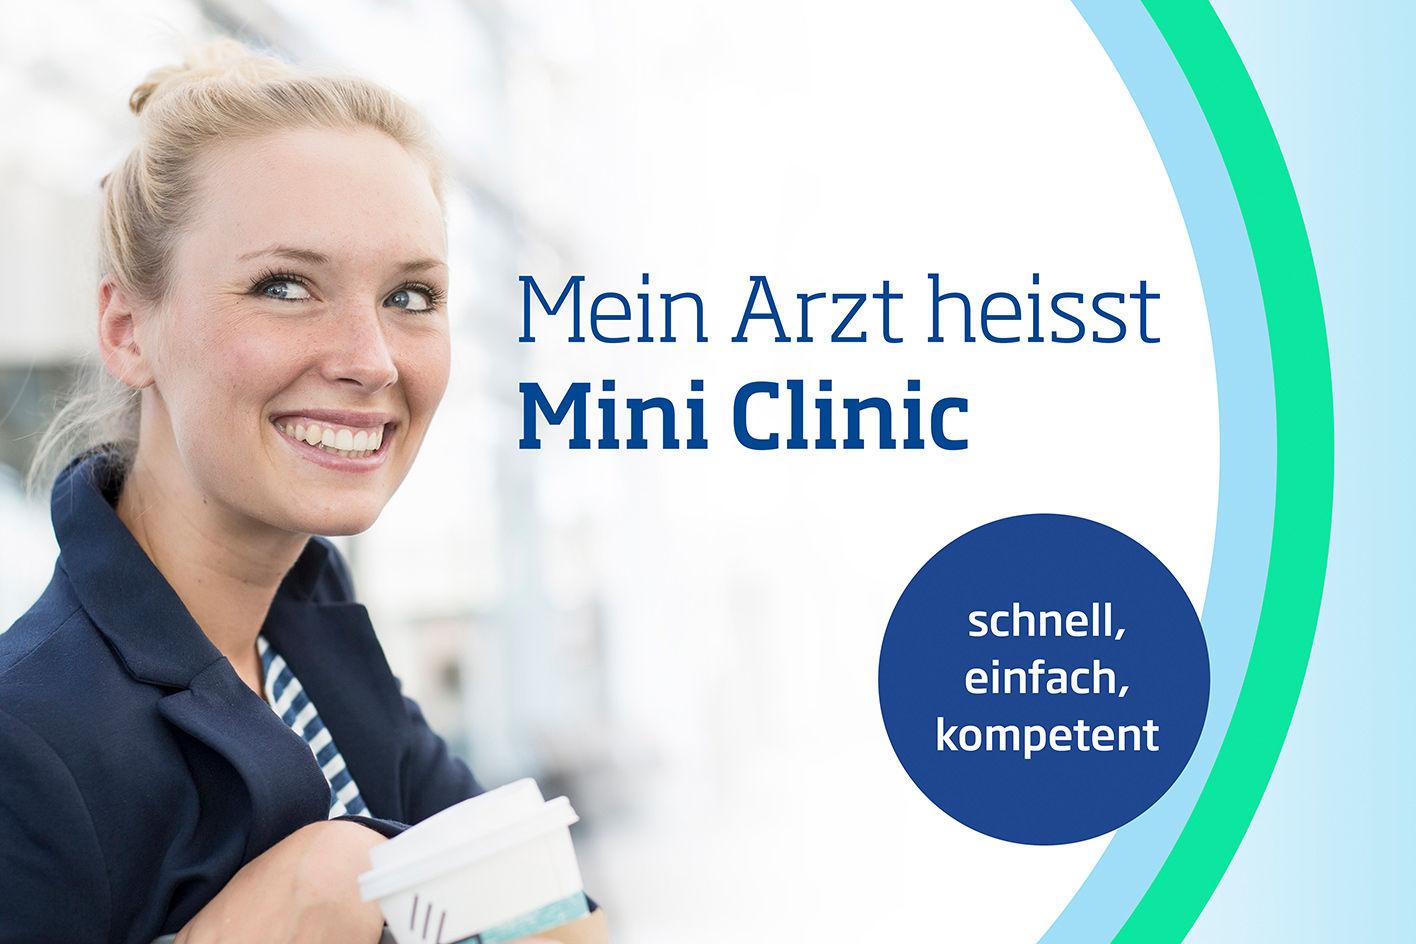 mini-clinic-basel-city_schnell-einfach-kompetent.jpg